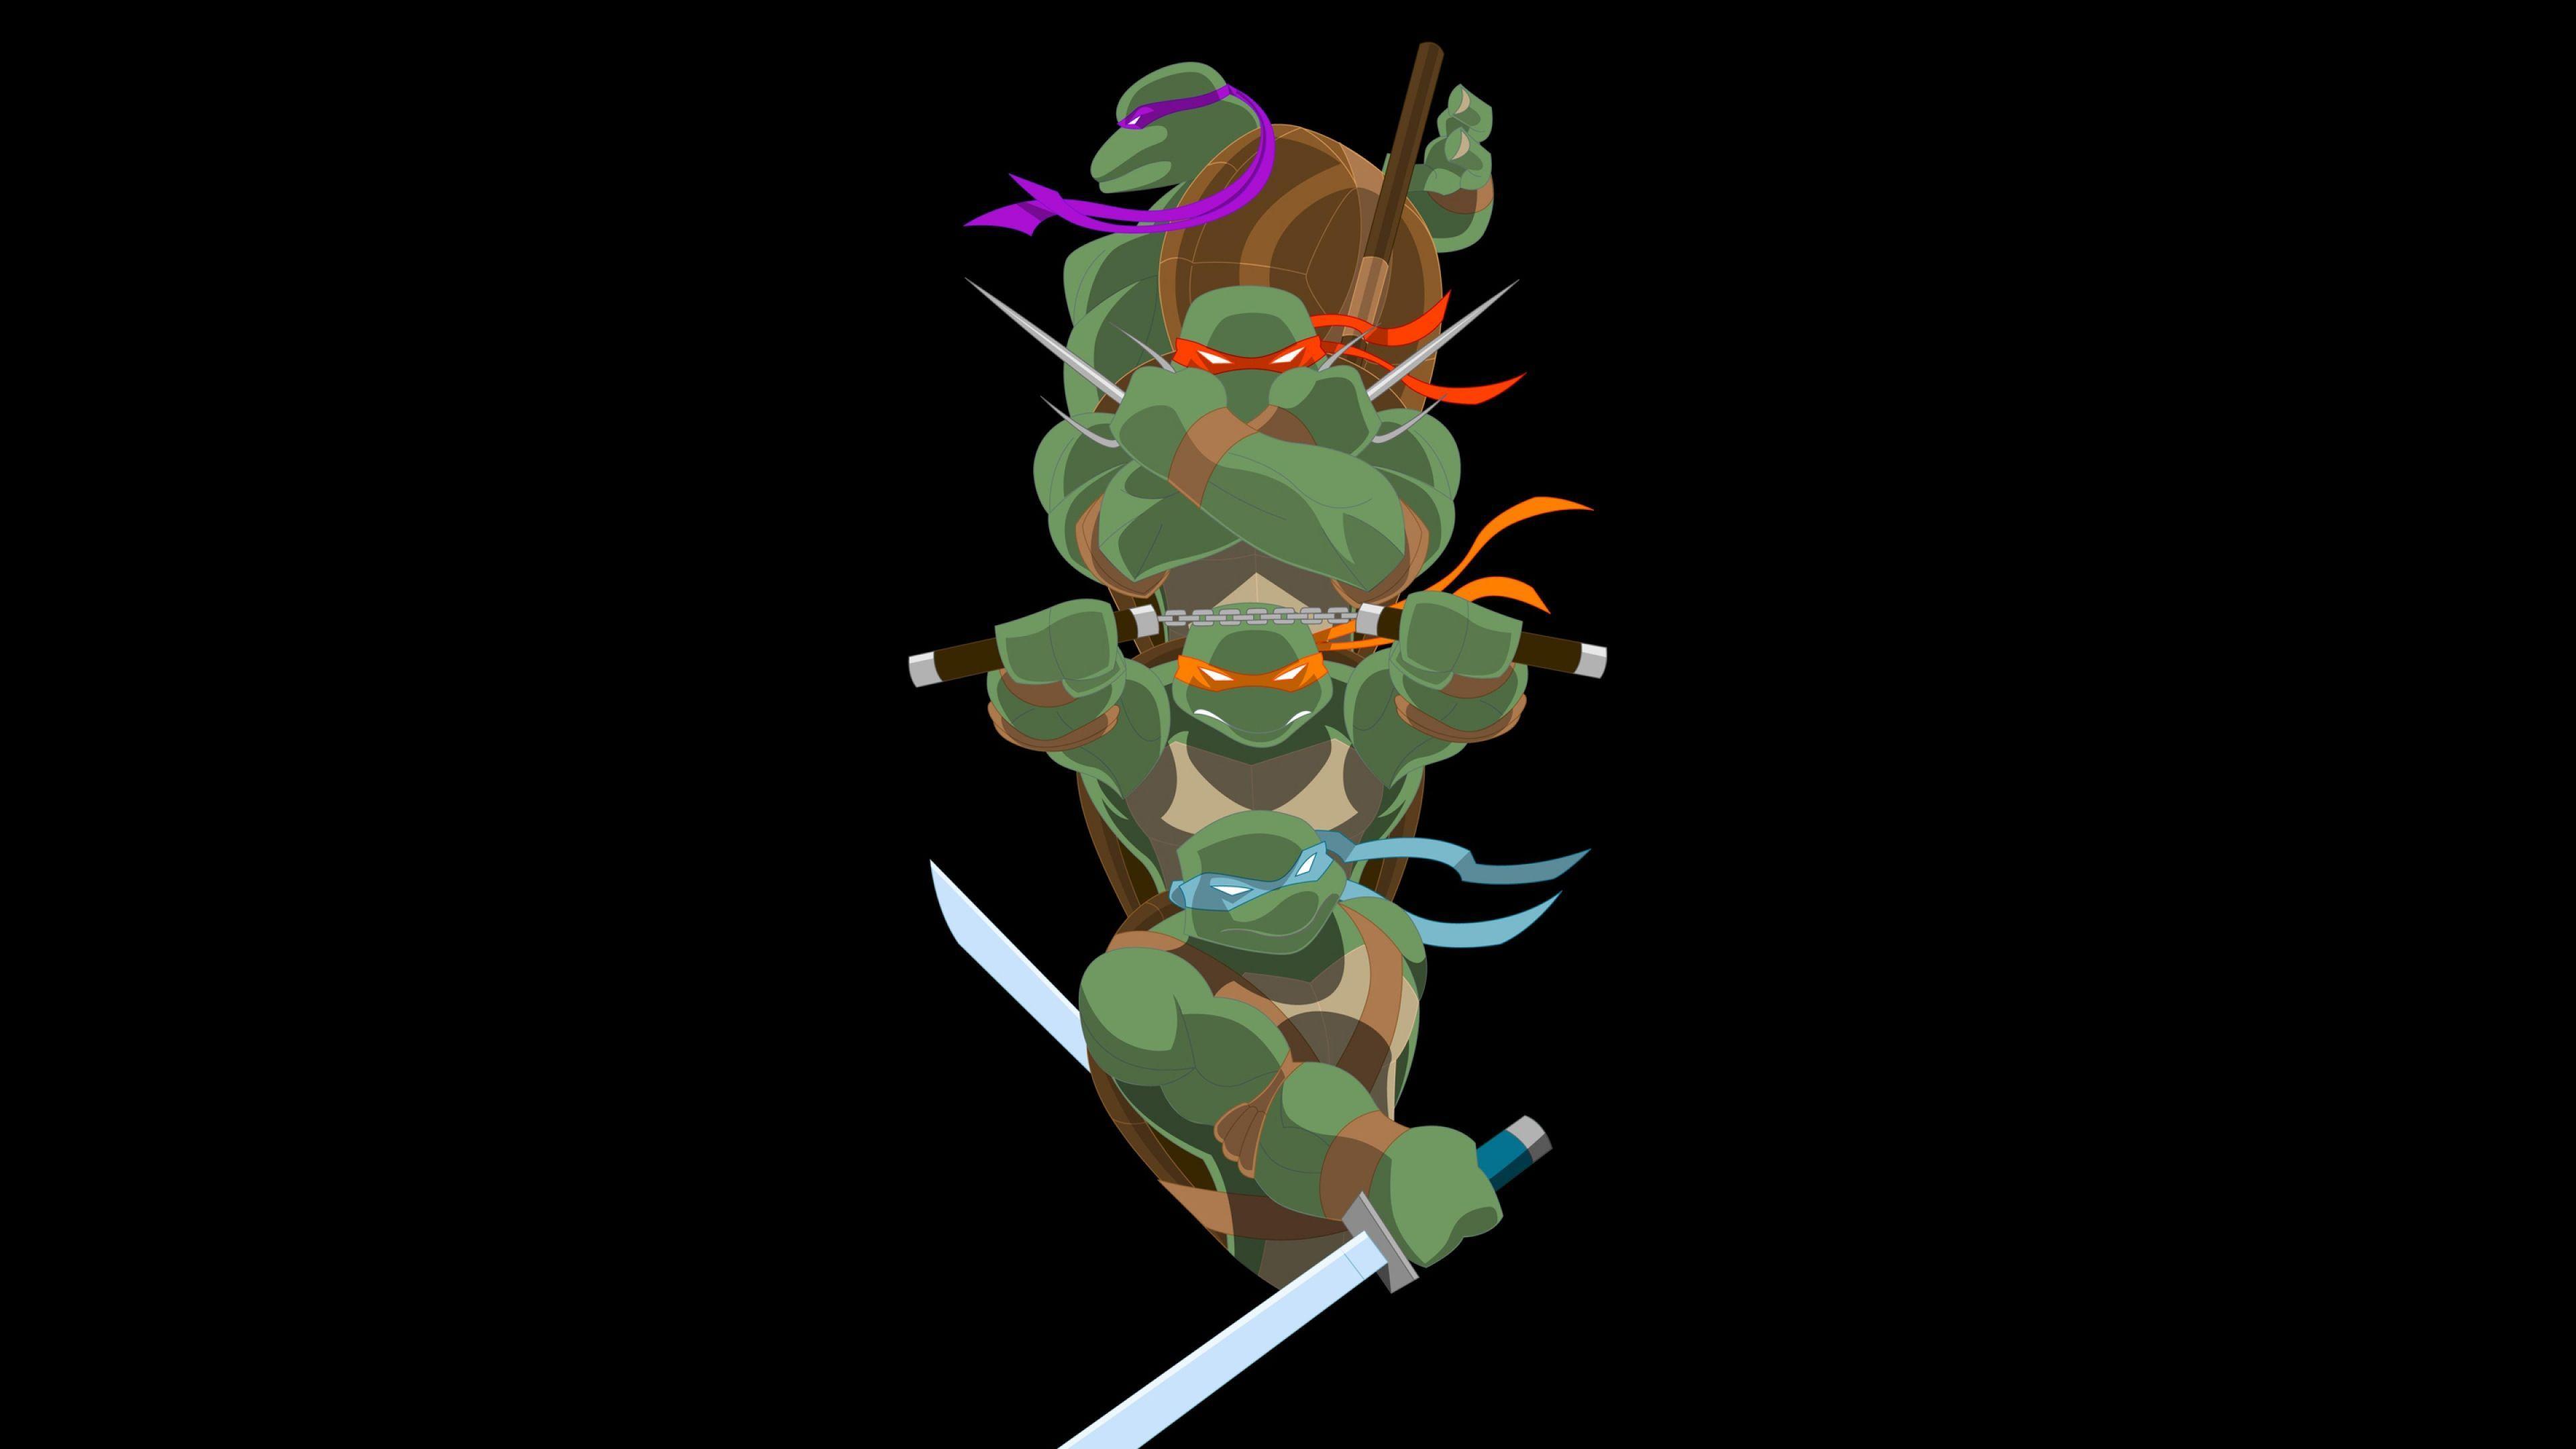 Ninja Turtle Tablet Wallpapers Top Free Ninja Turtle Tablet